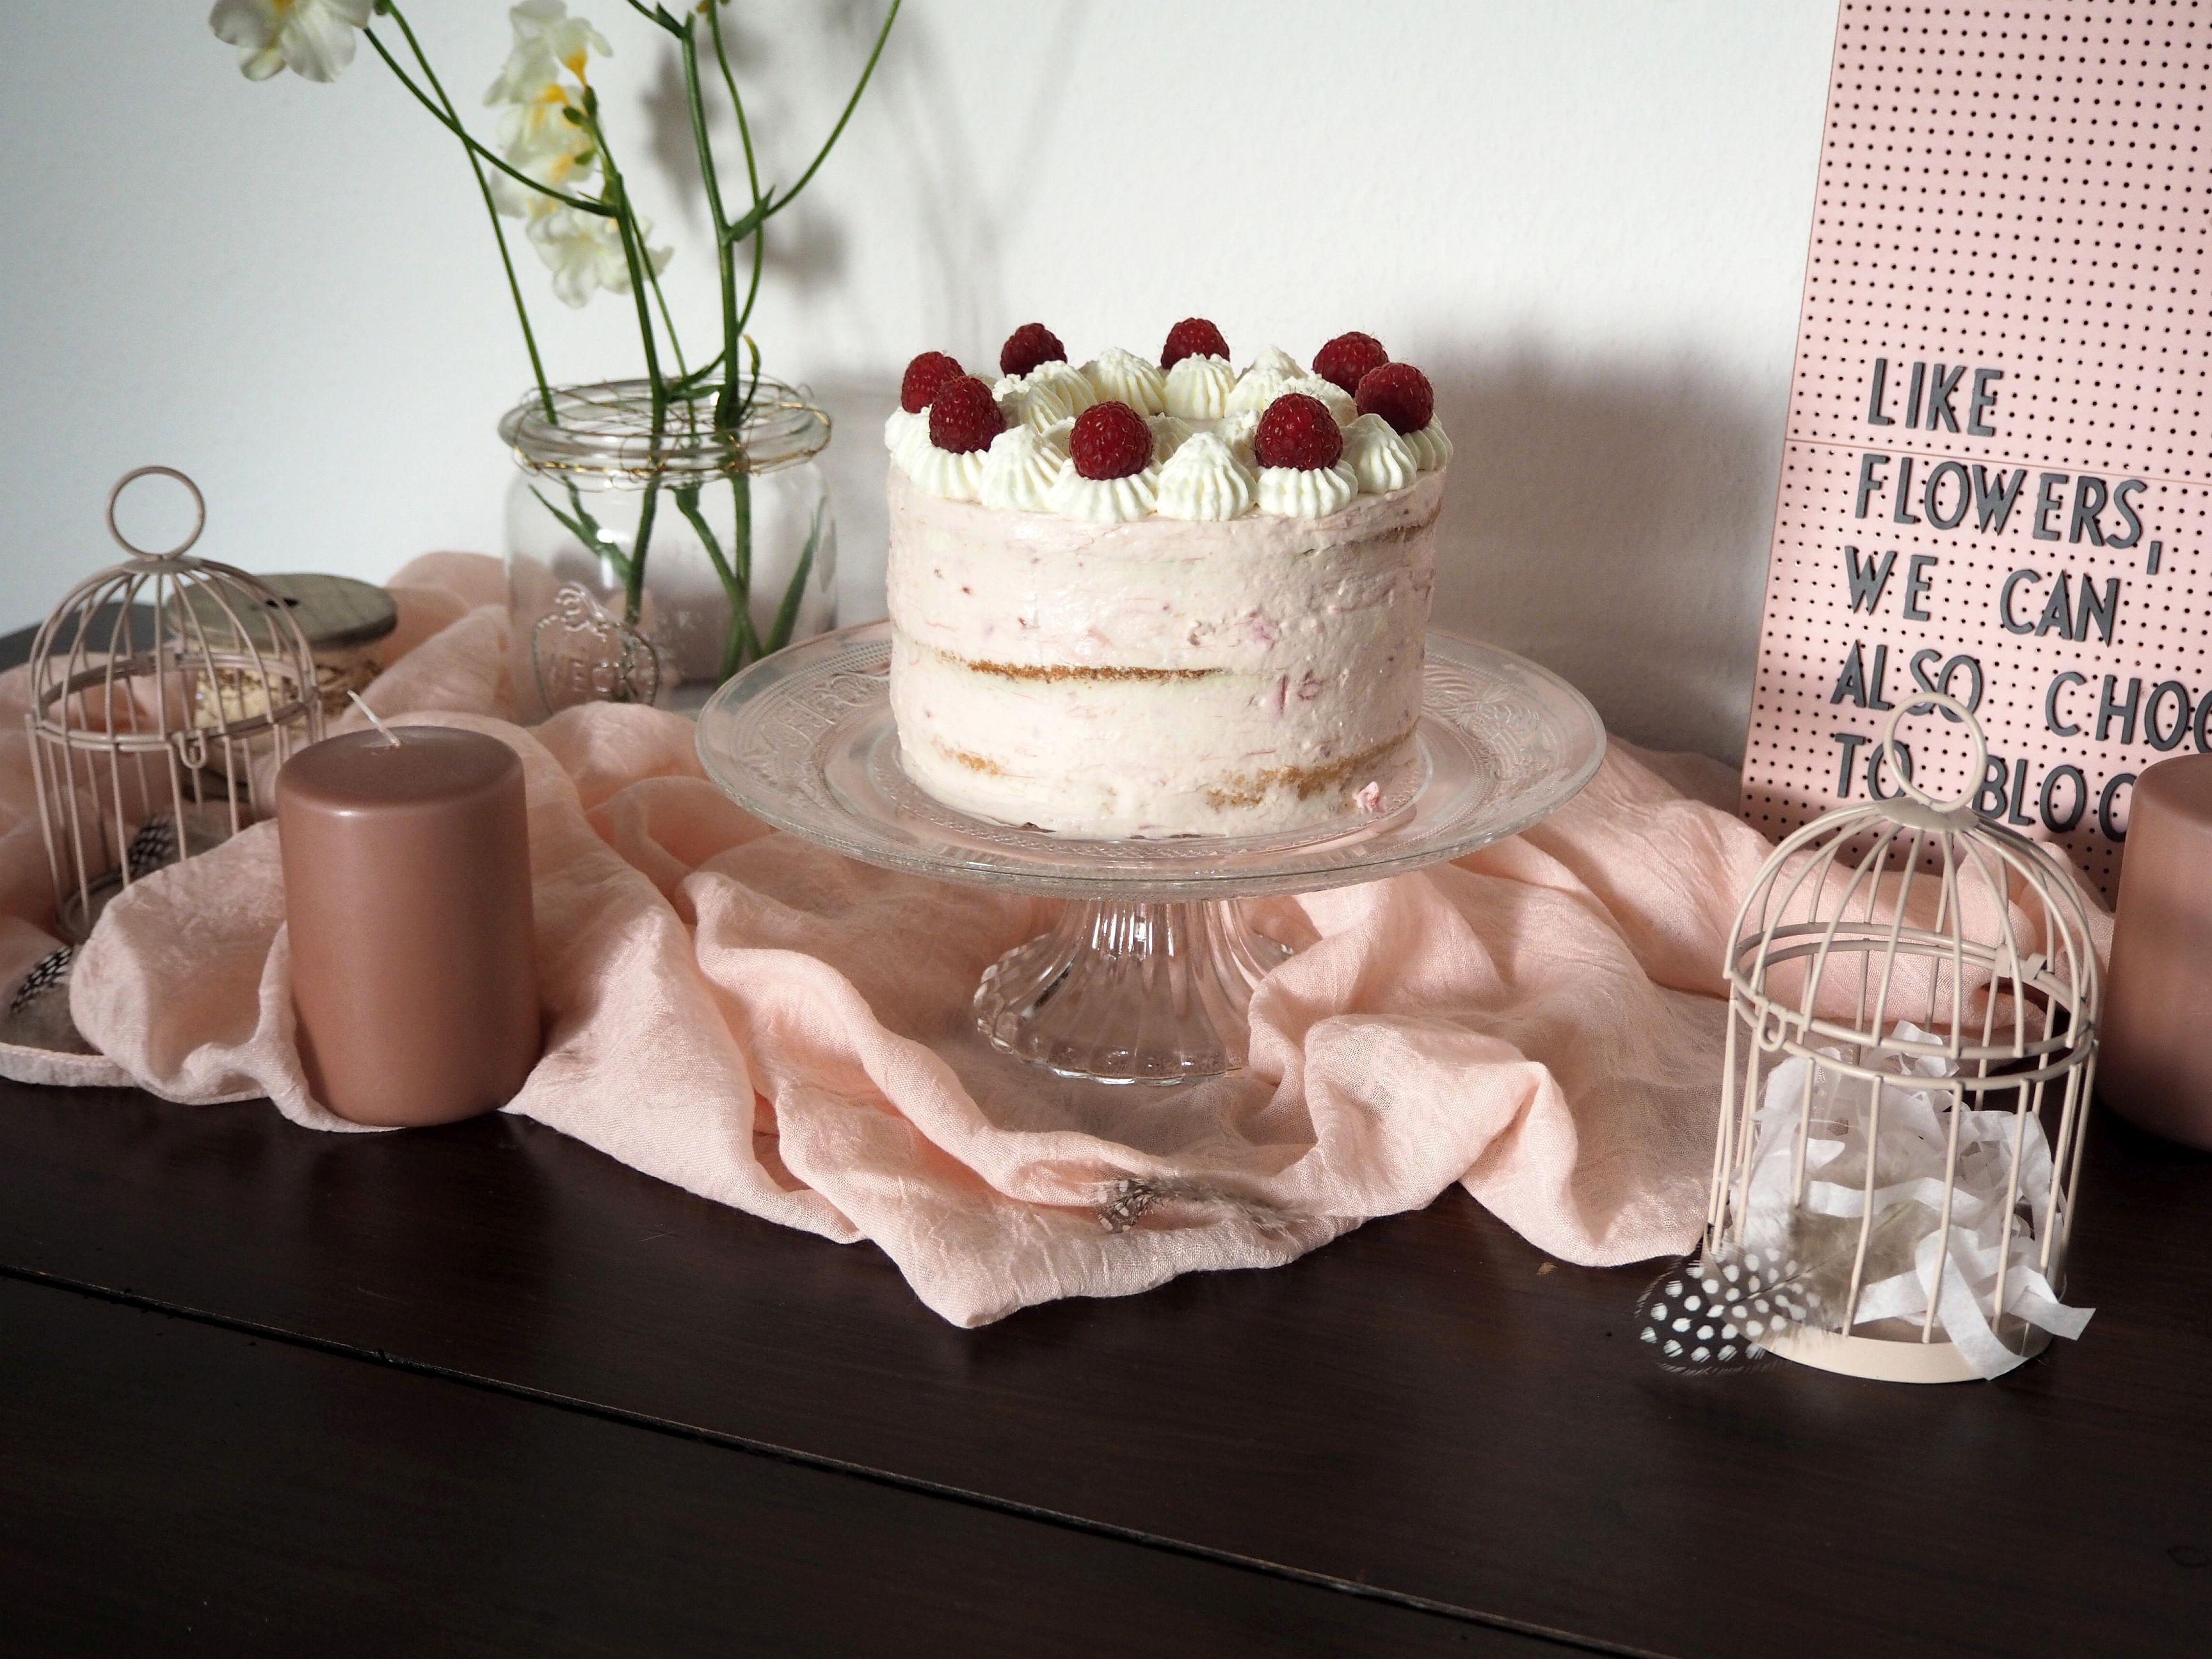 2018-04-skoen-och-kreativ-food-glad-pask-rhabarber-himbeer-toertchen-mit-crunch-zu-ostern (6)